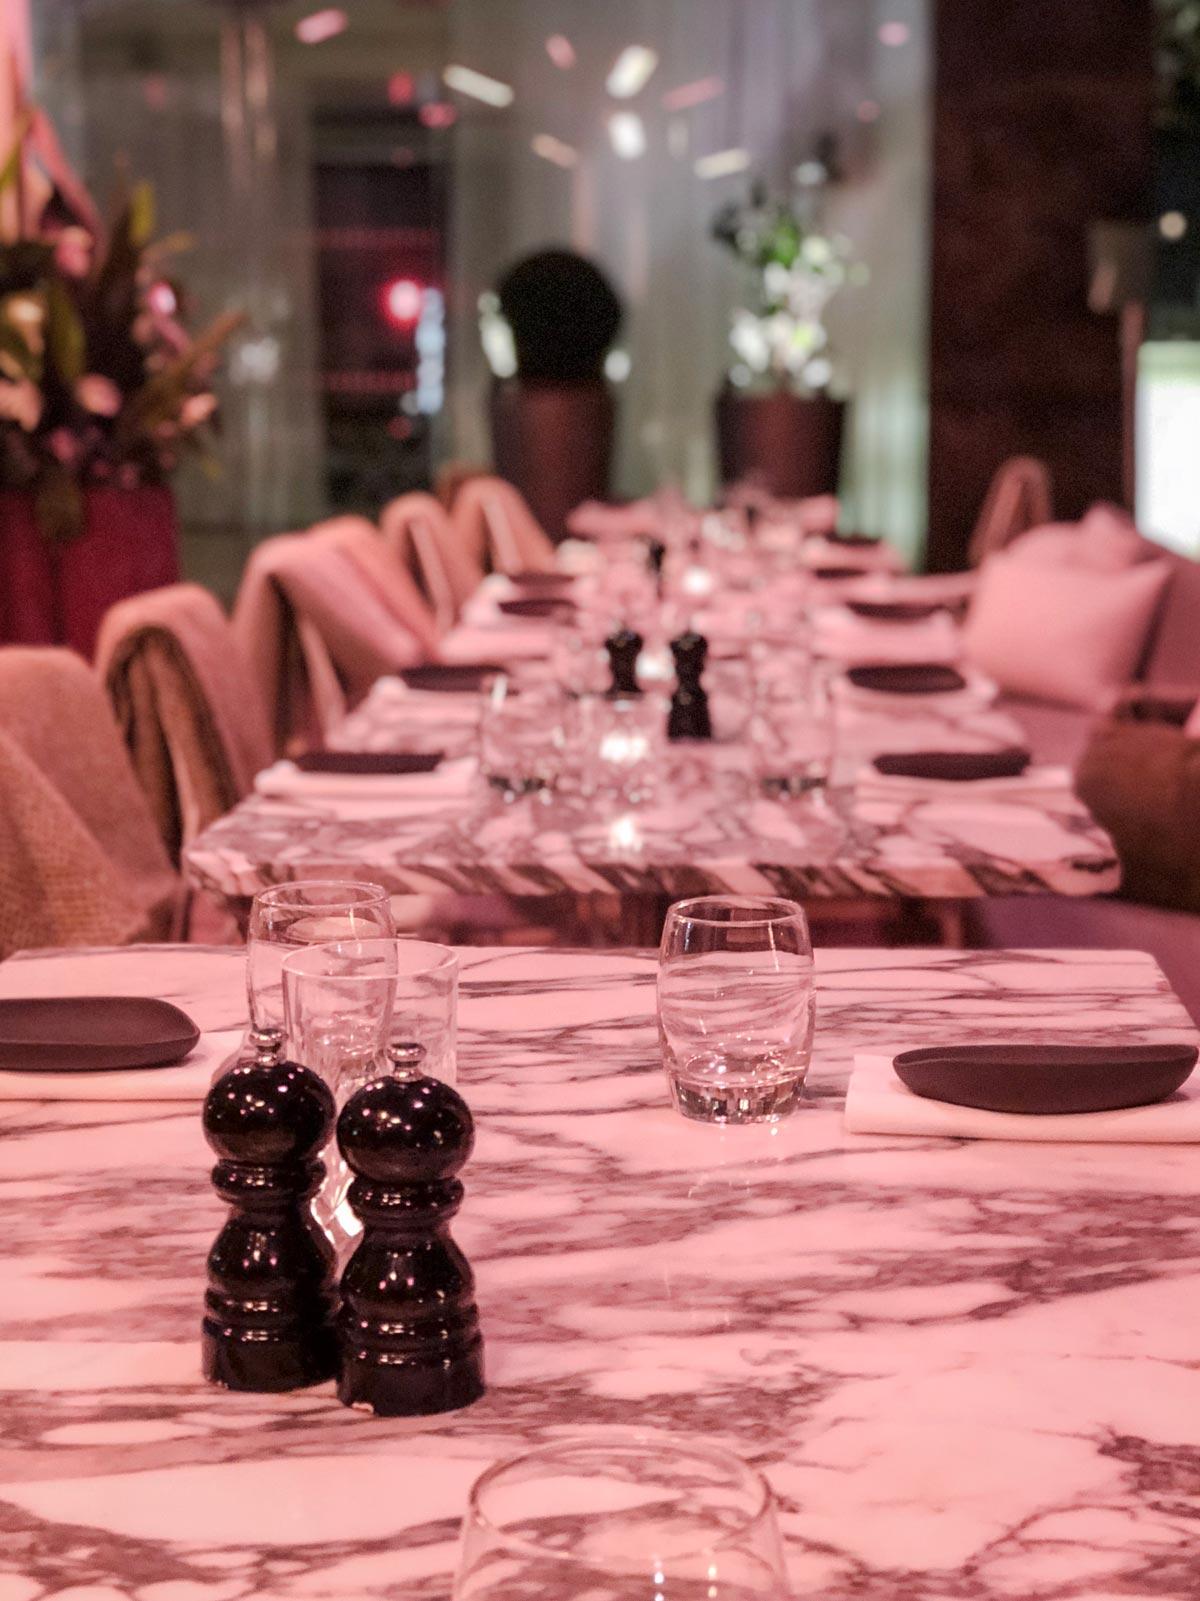 The Restaurant at Sanderson Hotel